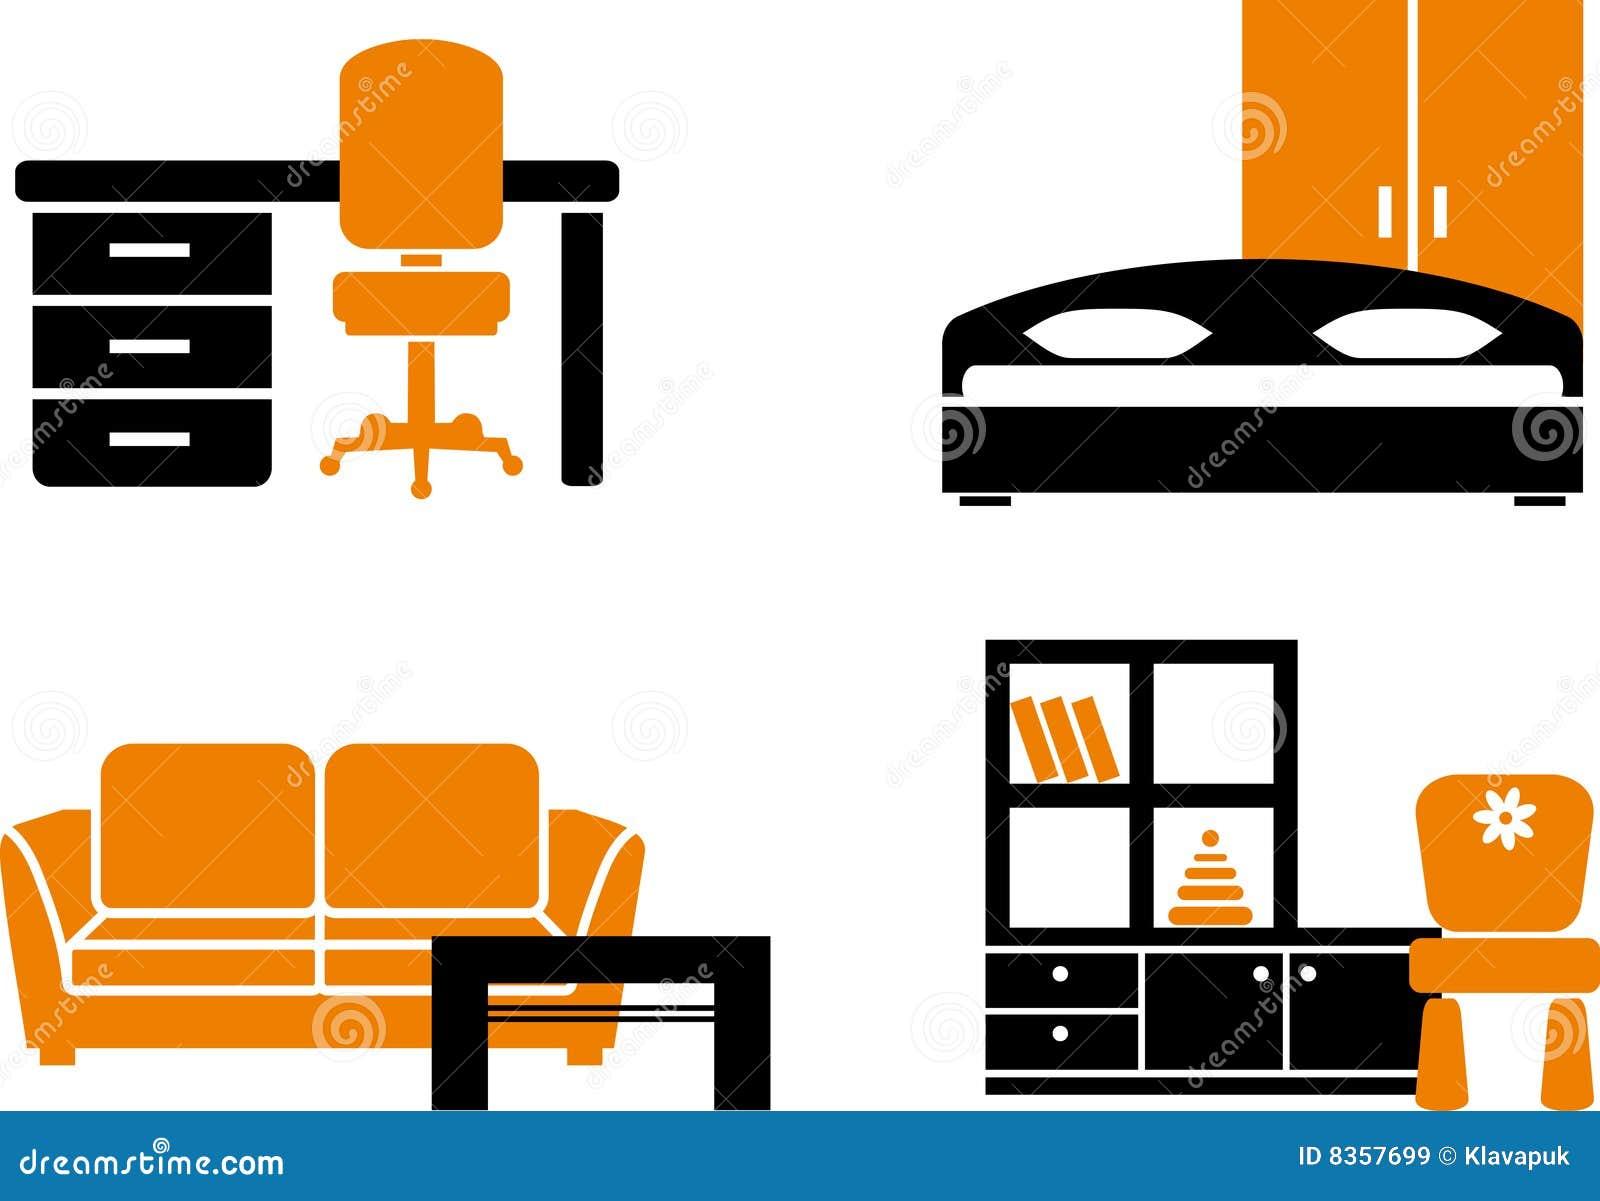 Furniture Icon Set Royalty Free Stock Image